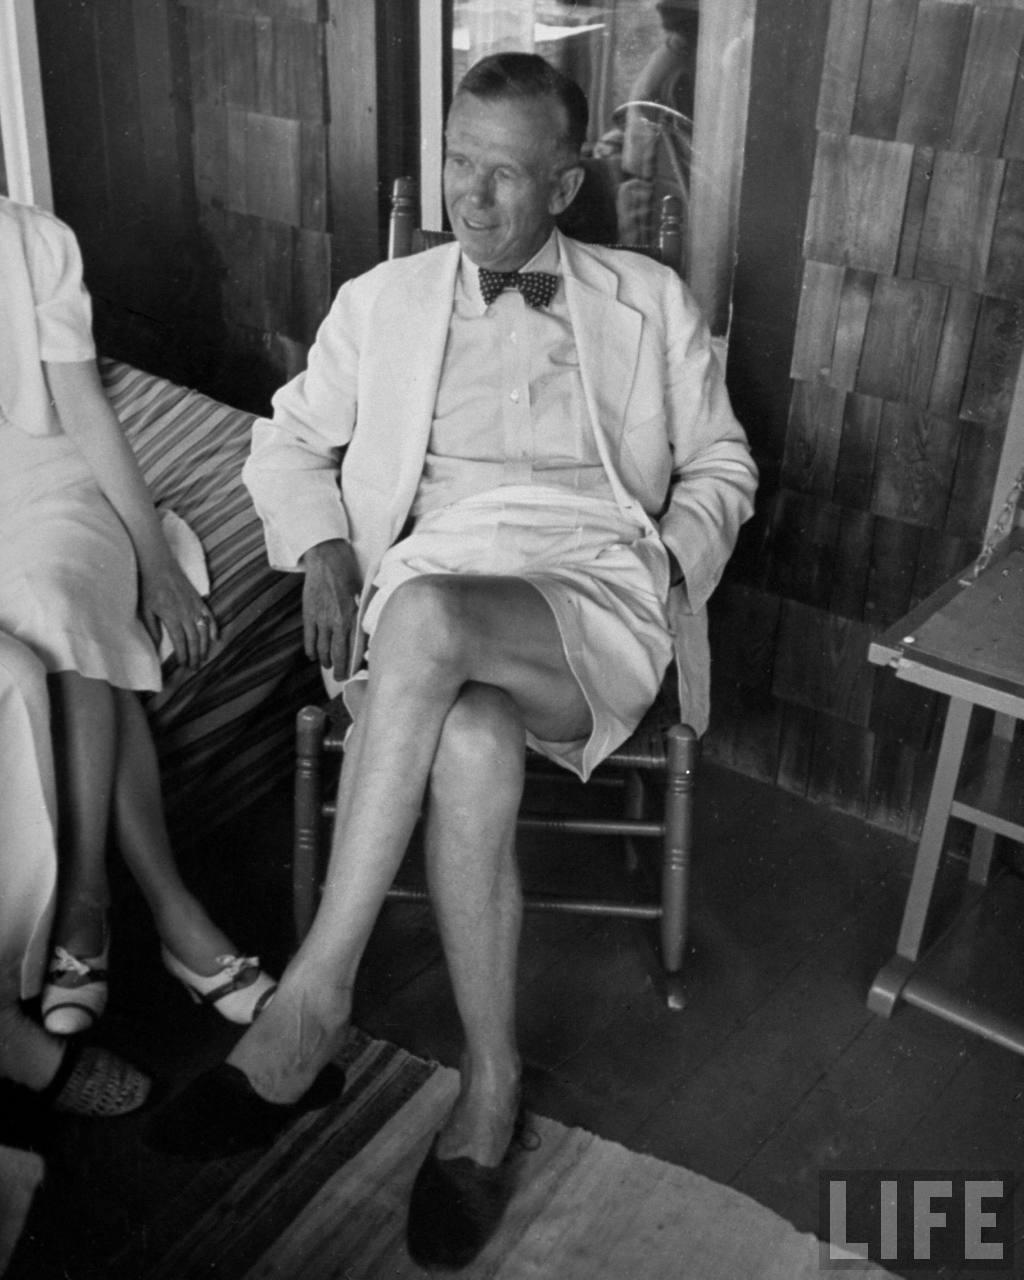 bermuda shorts bow tie jacket menswear